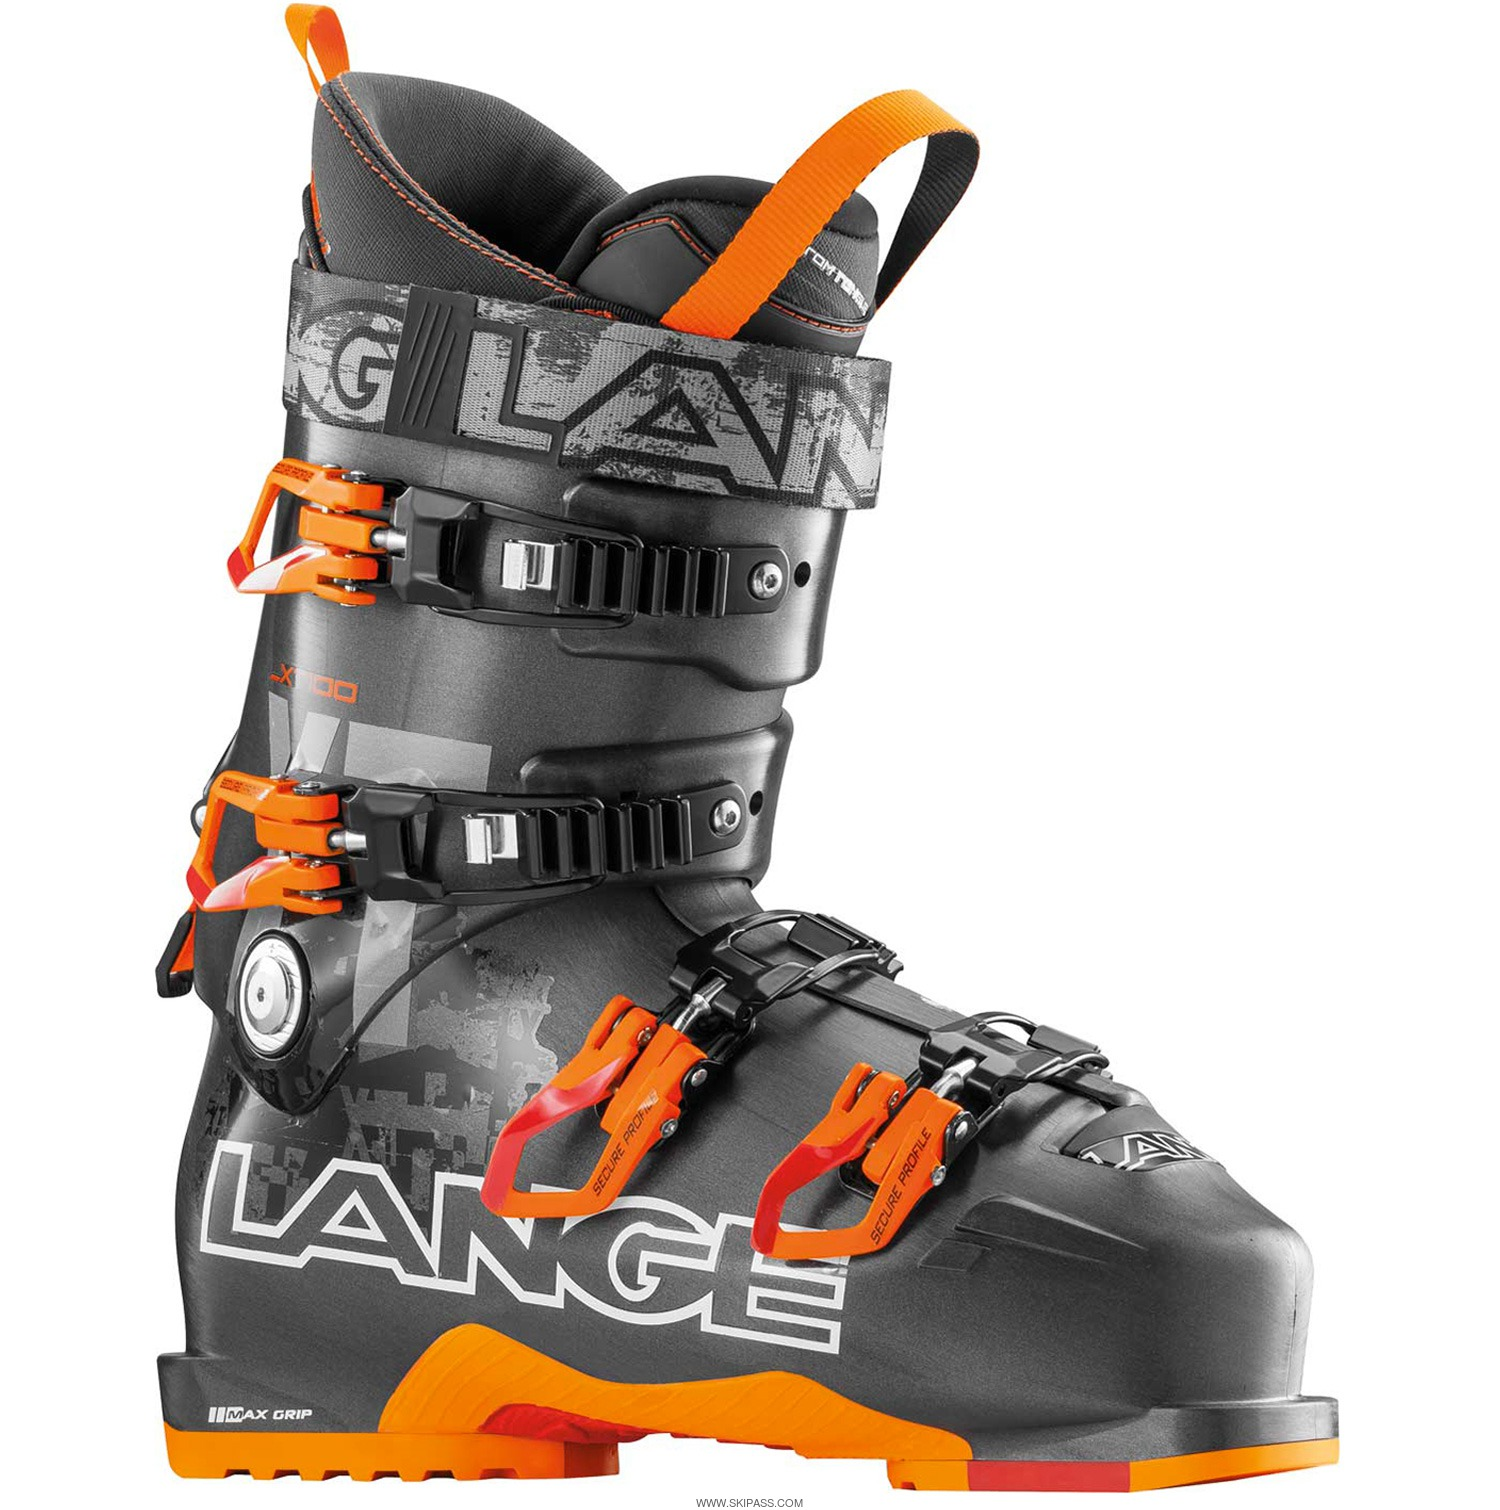 Lange Xt 100 Chaussure Ski Homme  - Chaussures Ski Homme